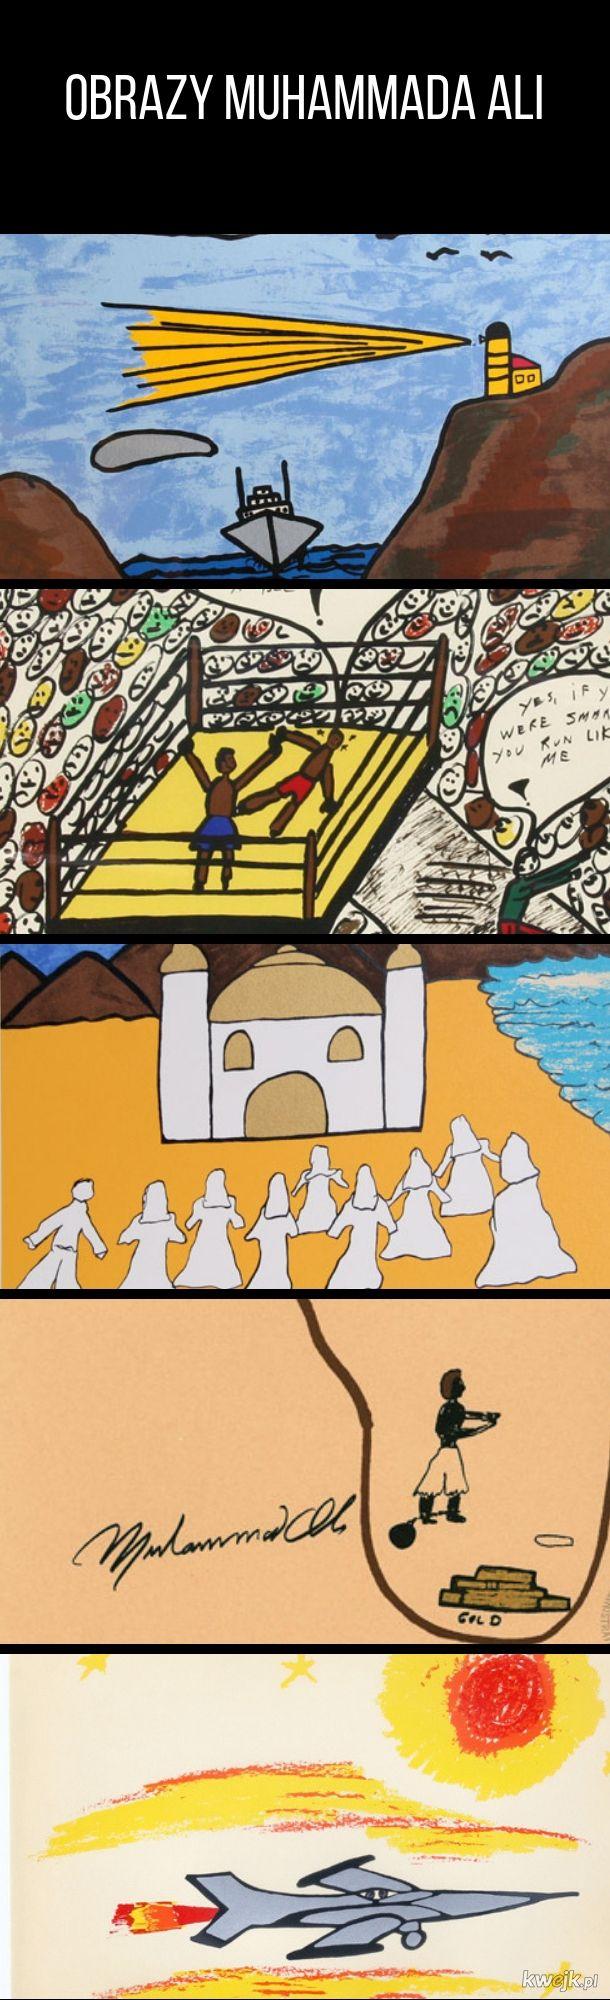 Obrazy Muhammada Ali